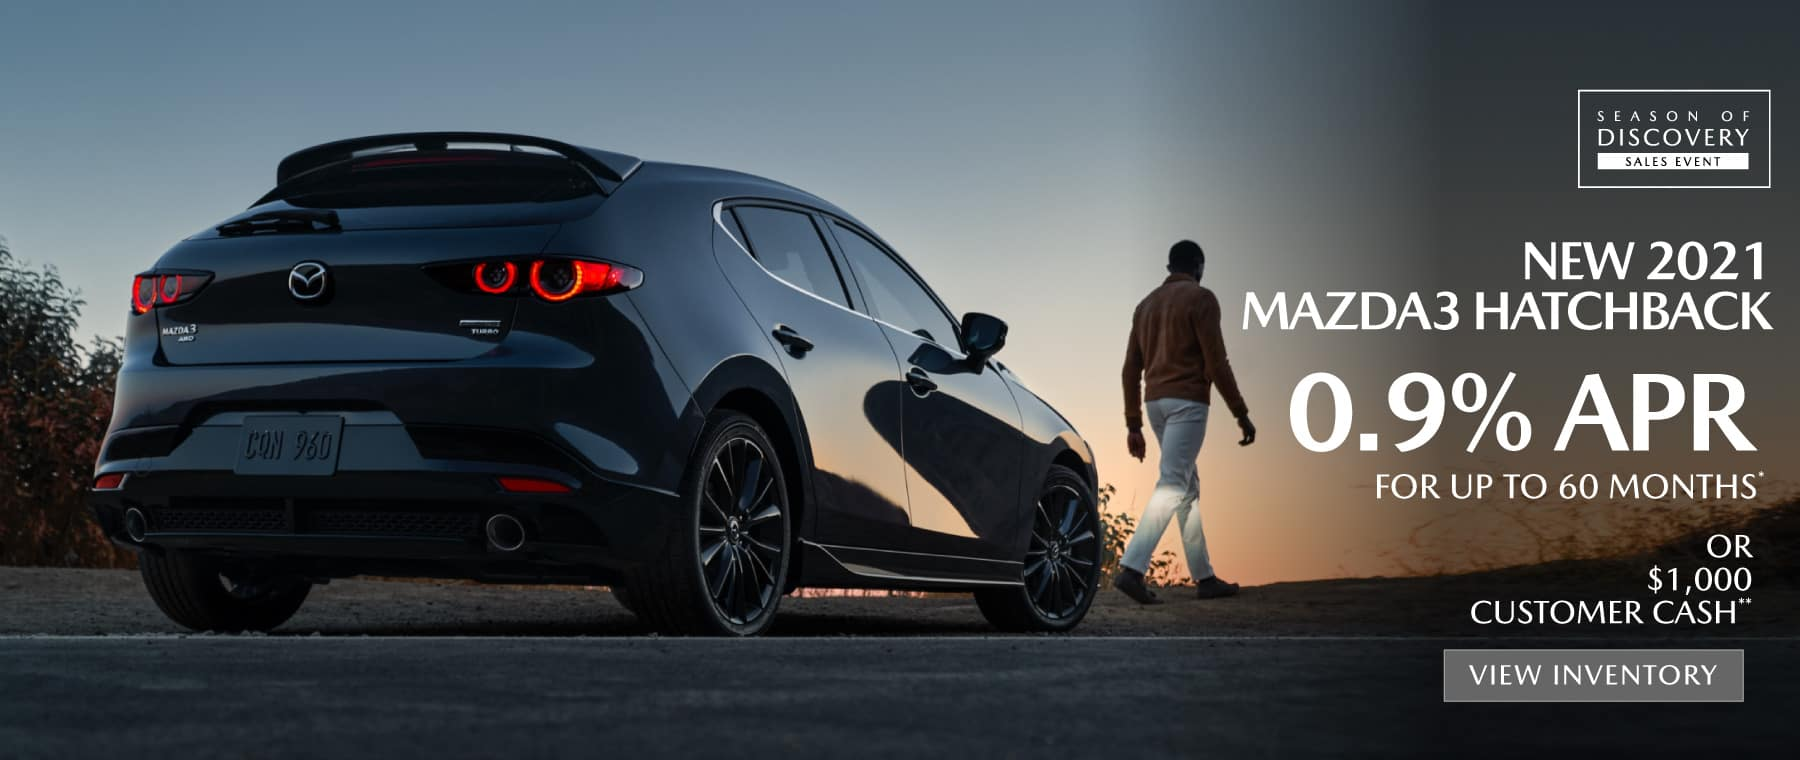 New 2021 MAZDA3 Hatchback – 0.9% APR for up to 60 months* OR $1,000 Customer Cash**